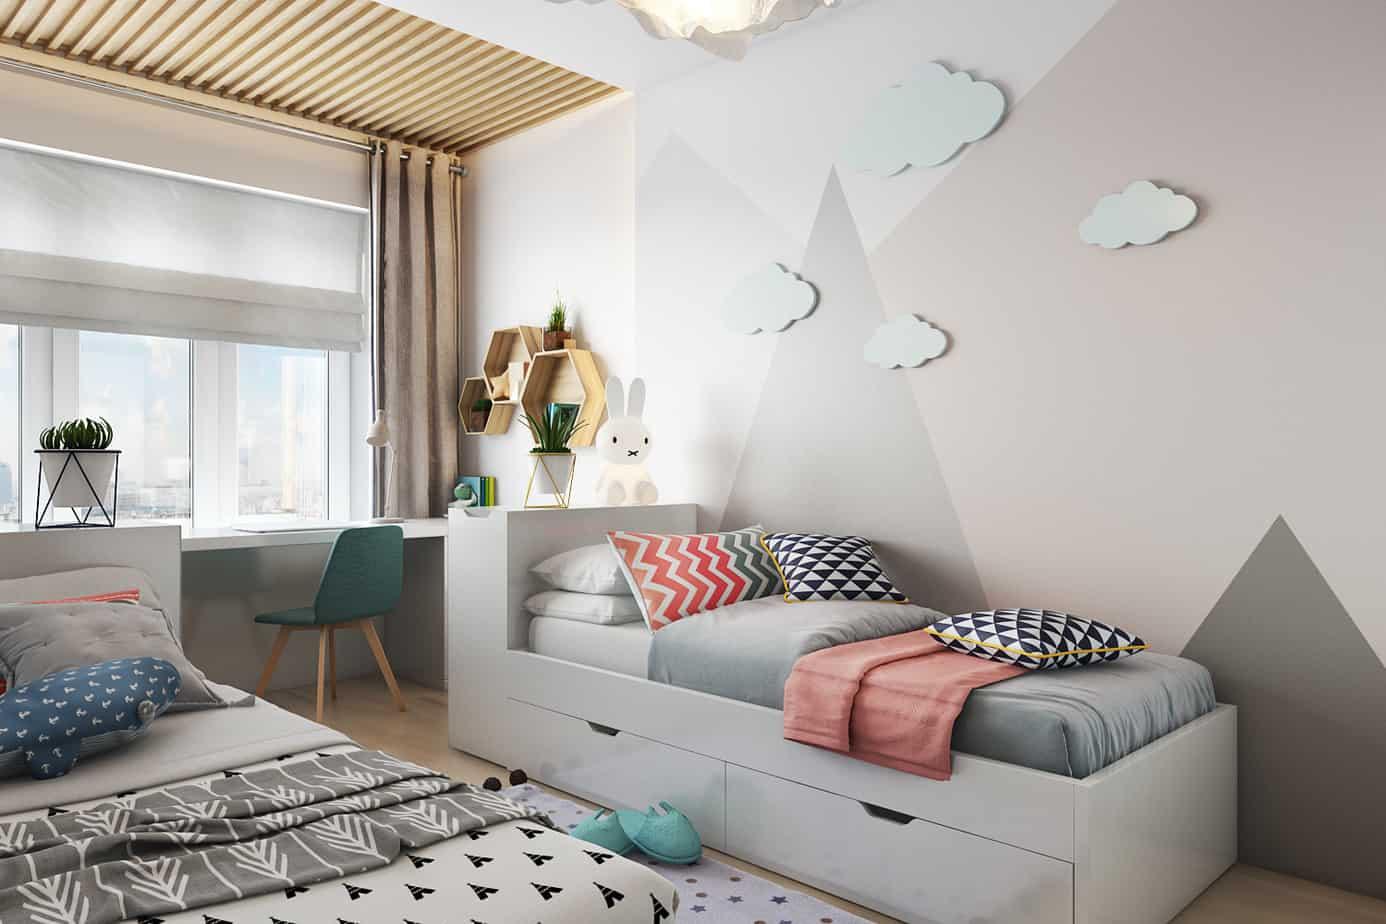 kids room interior 2021 pastel colors